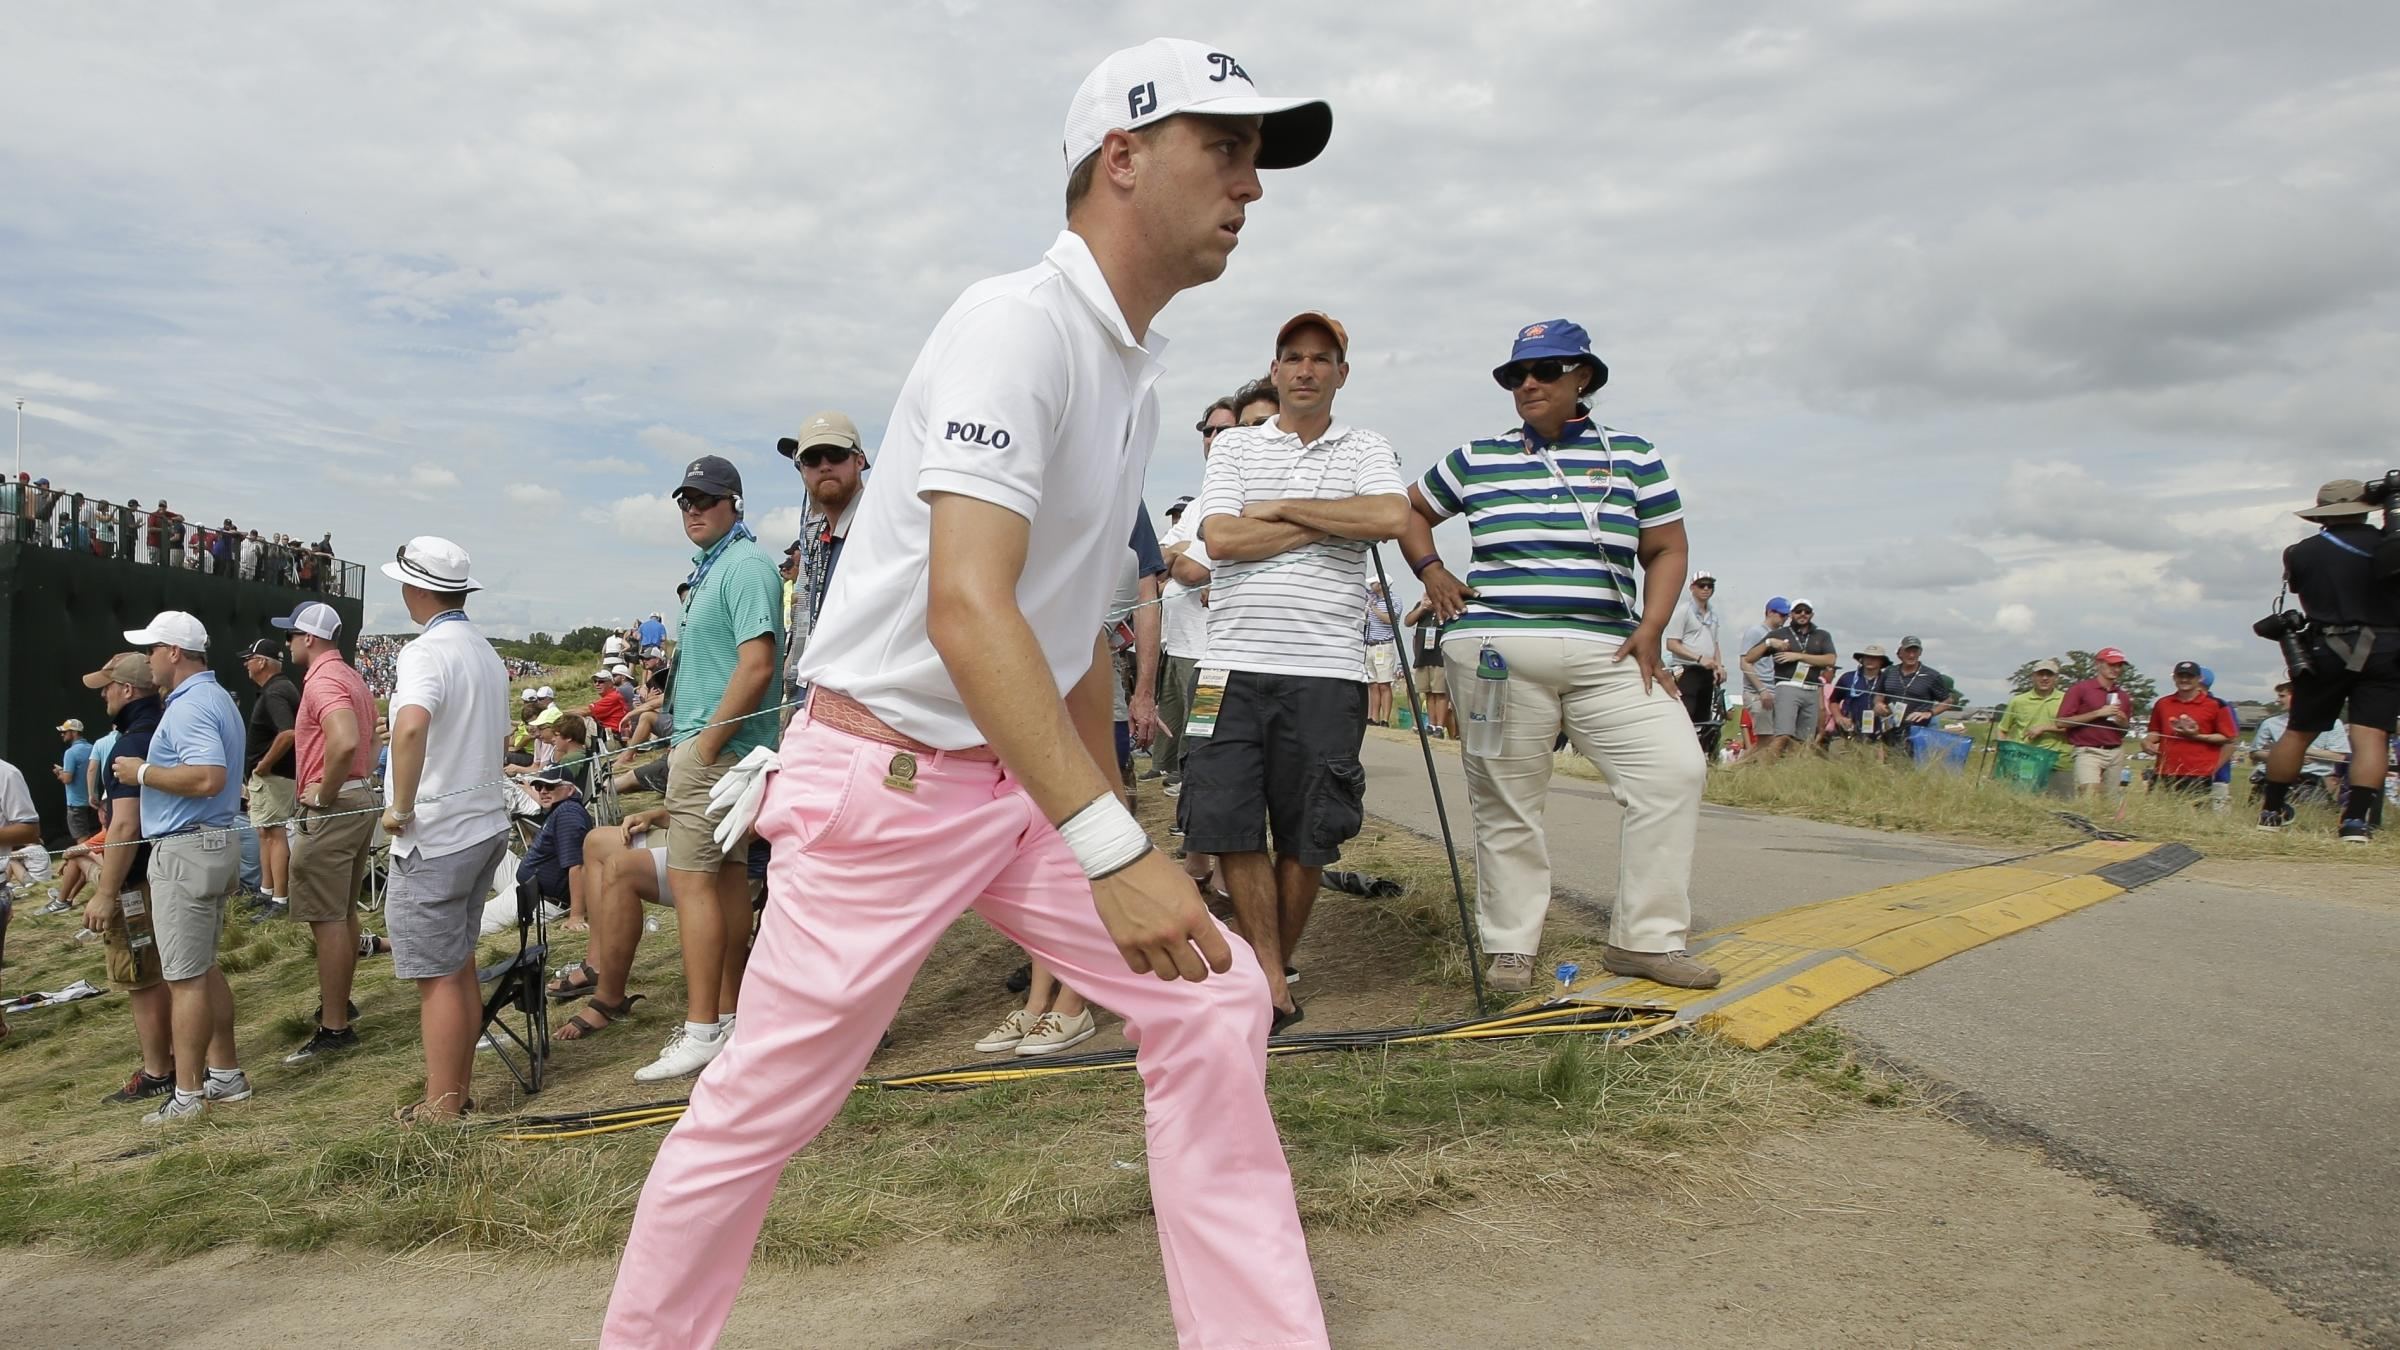 Golf's best miss cut leaving crazy logjam at Open